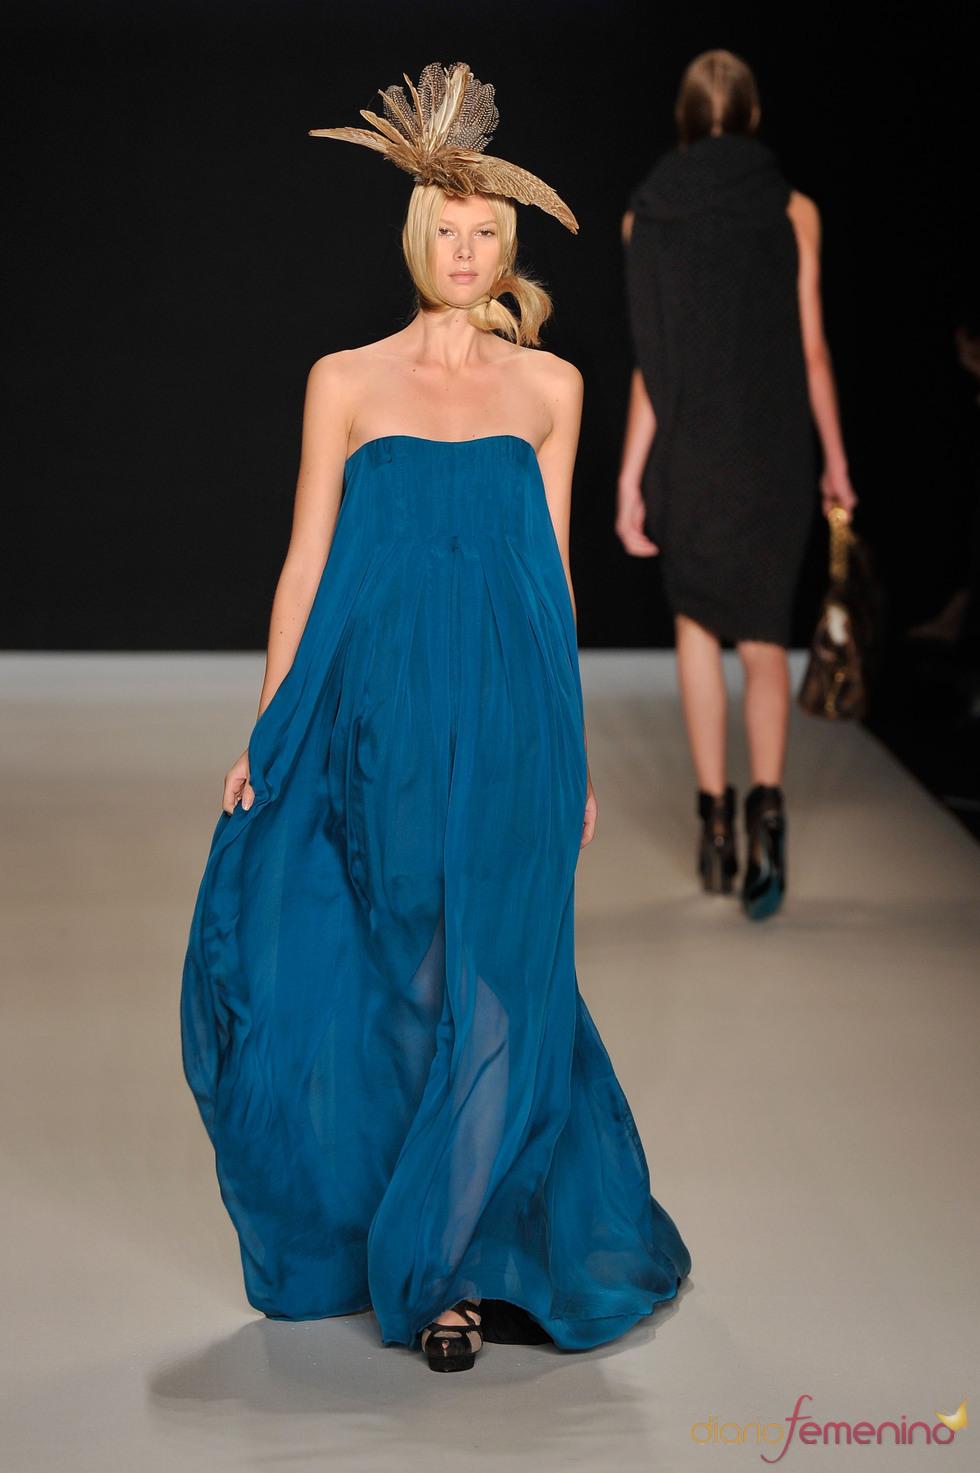 Vestido azul de Tomaszewski para la Berlín Fashion Week 2011